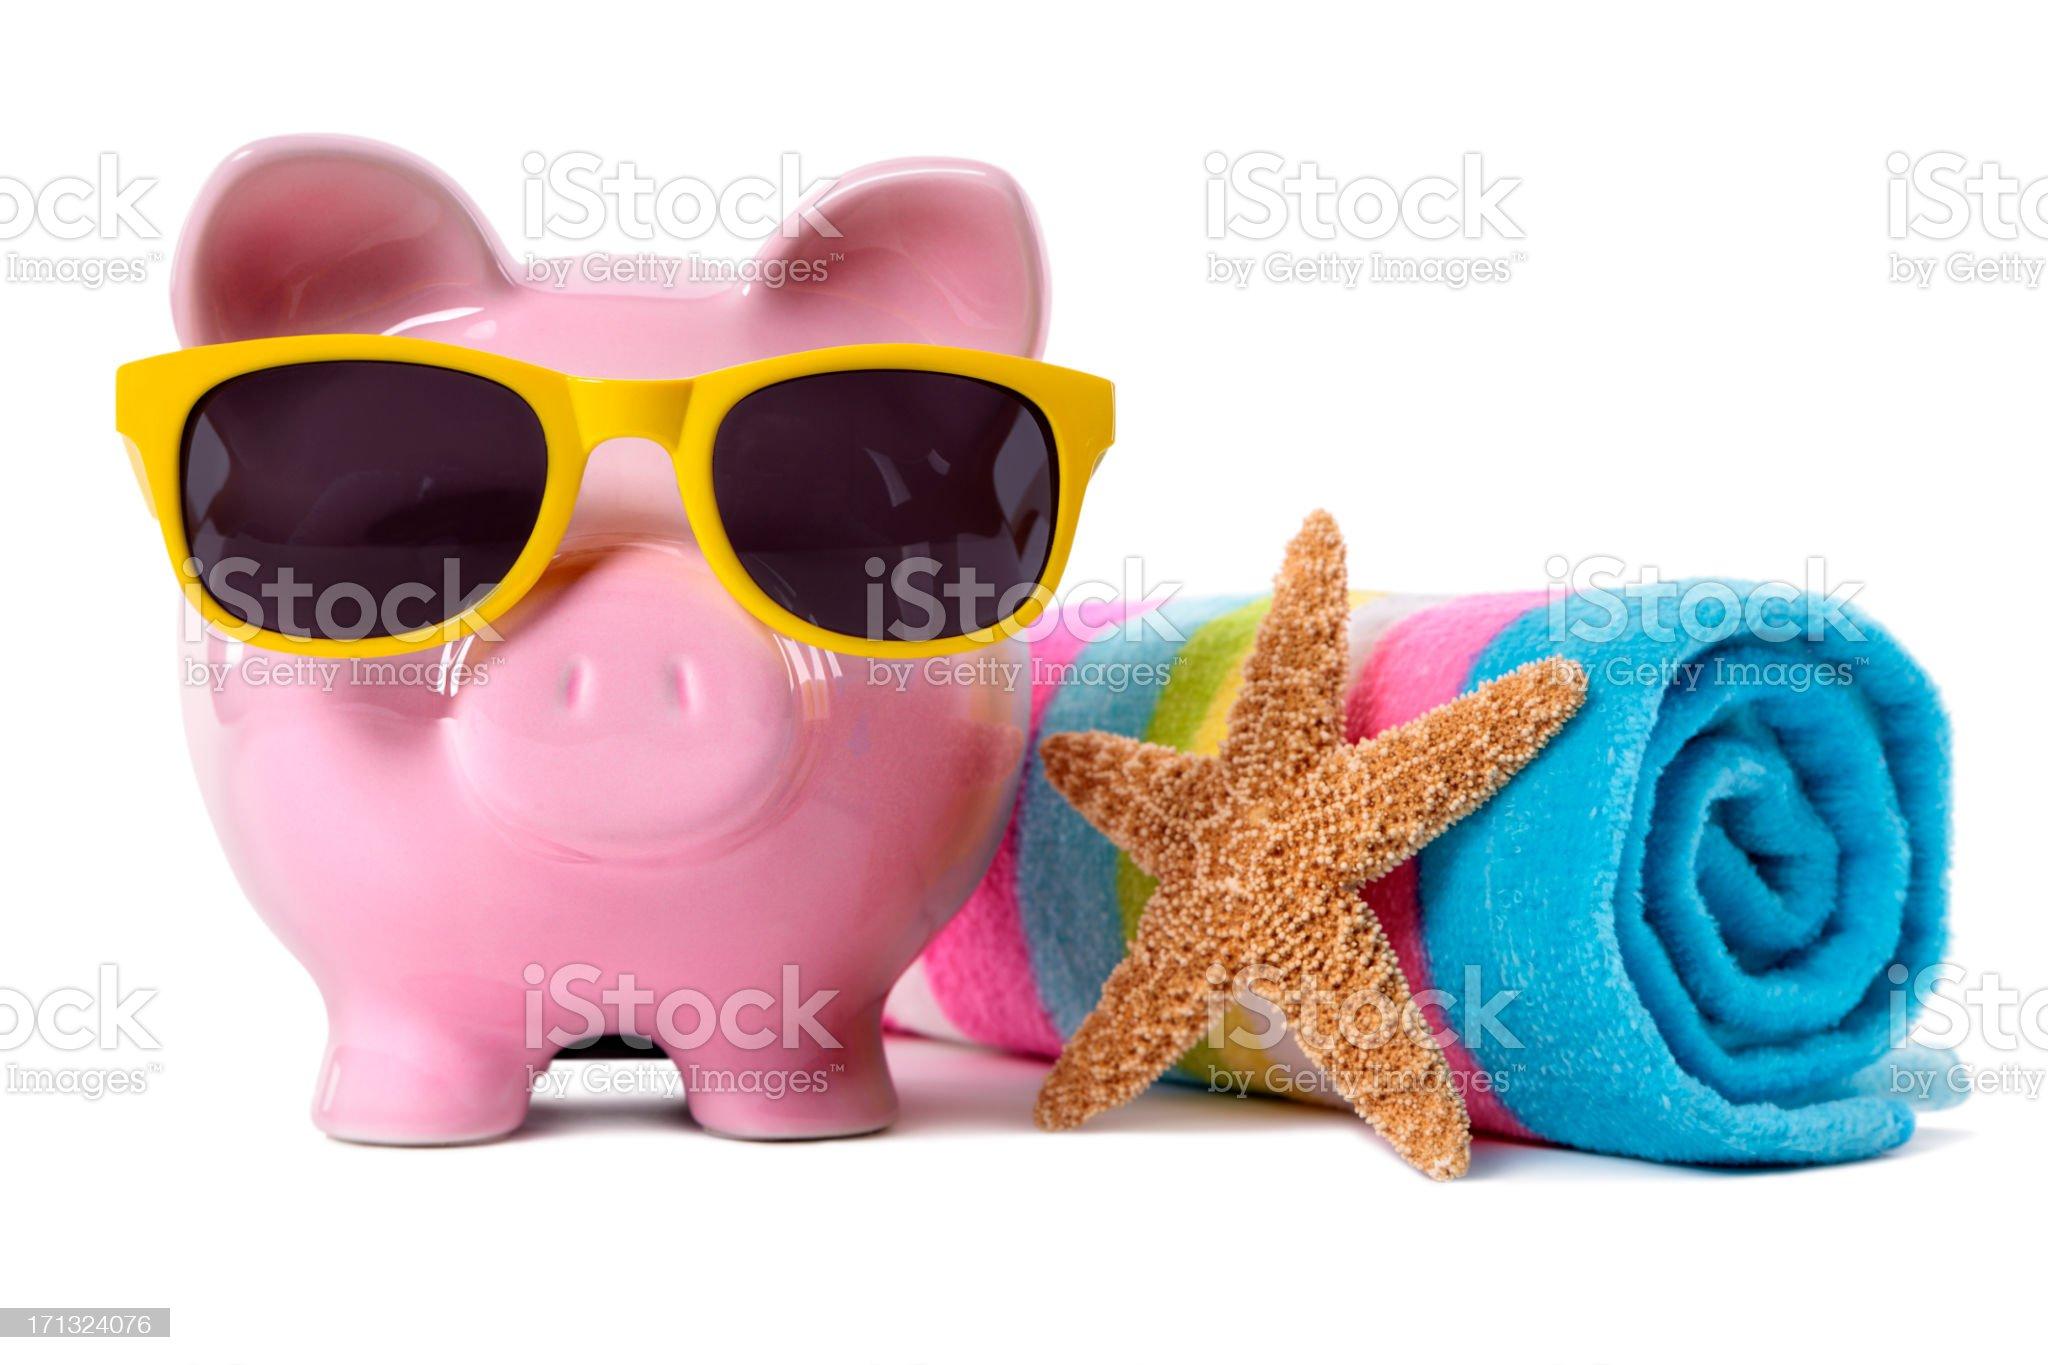 Piggy bank wearing sunglasses on beach vacation royalty-free stock photo